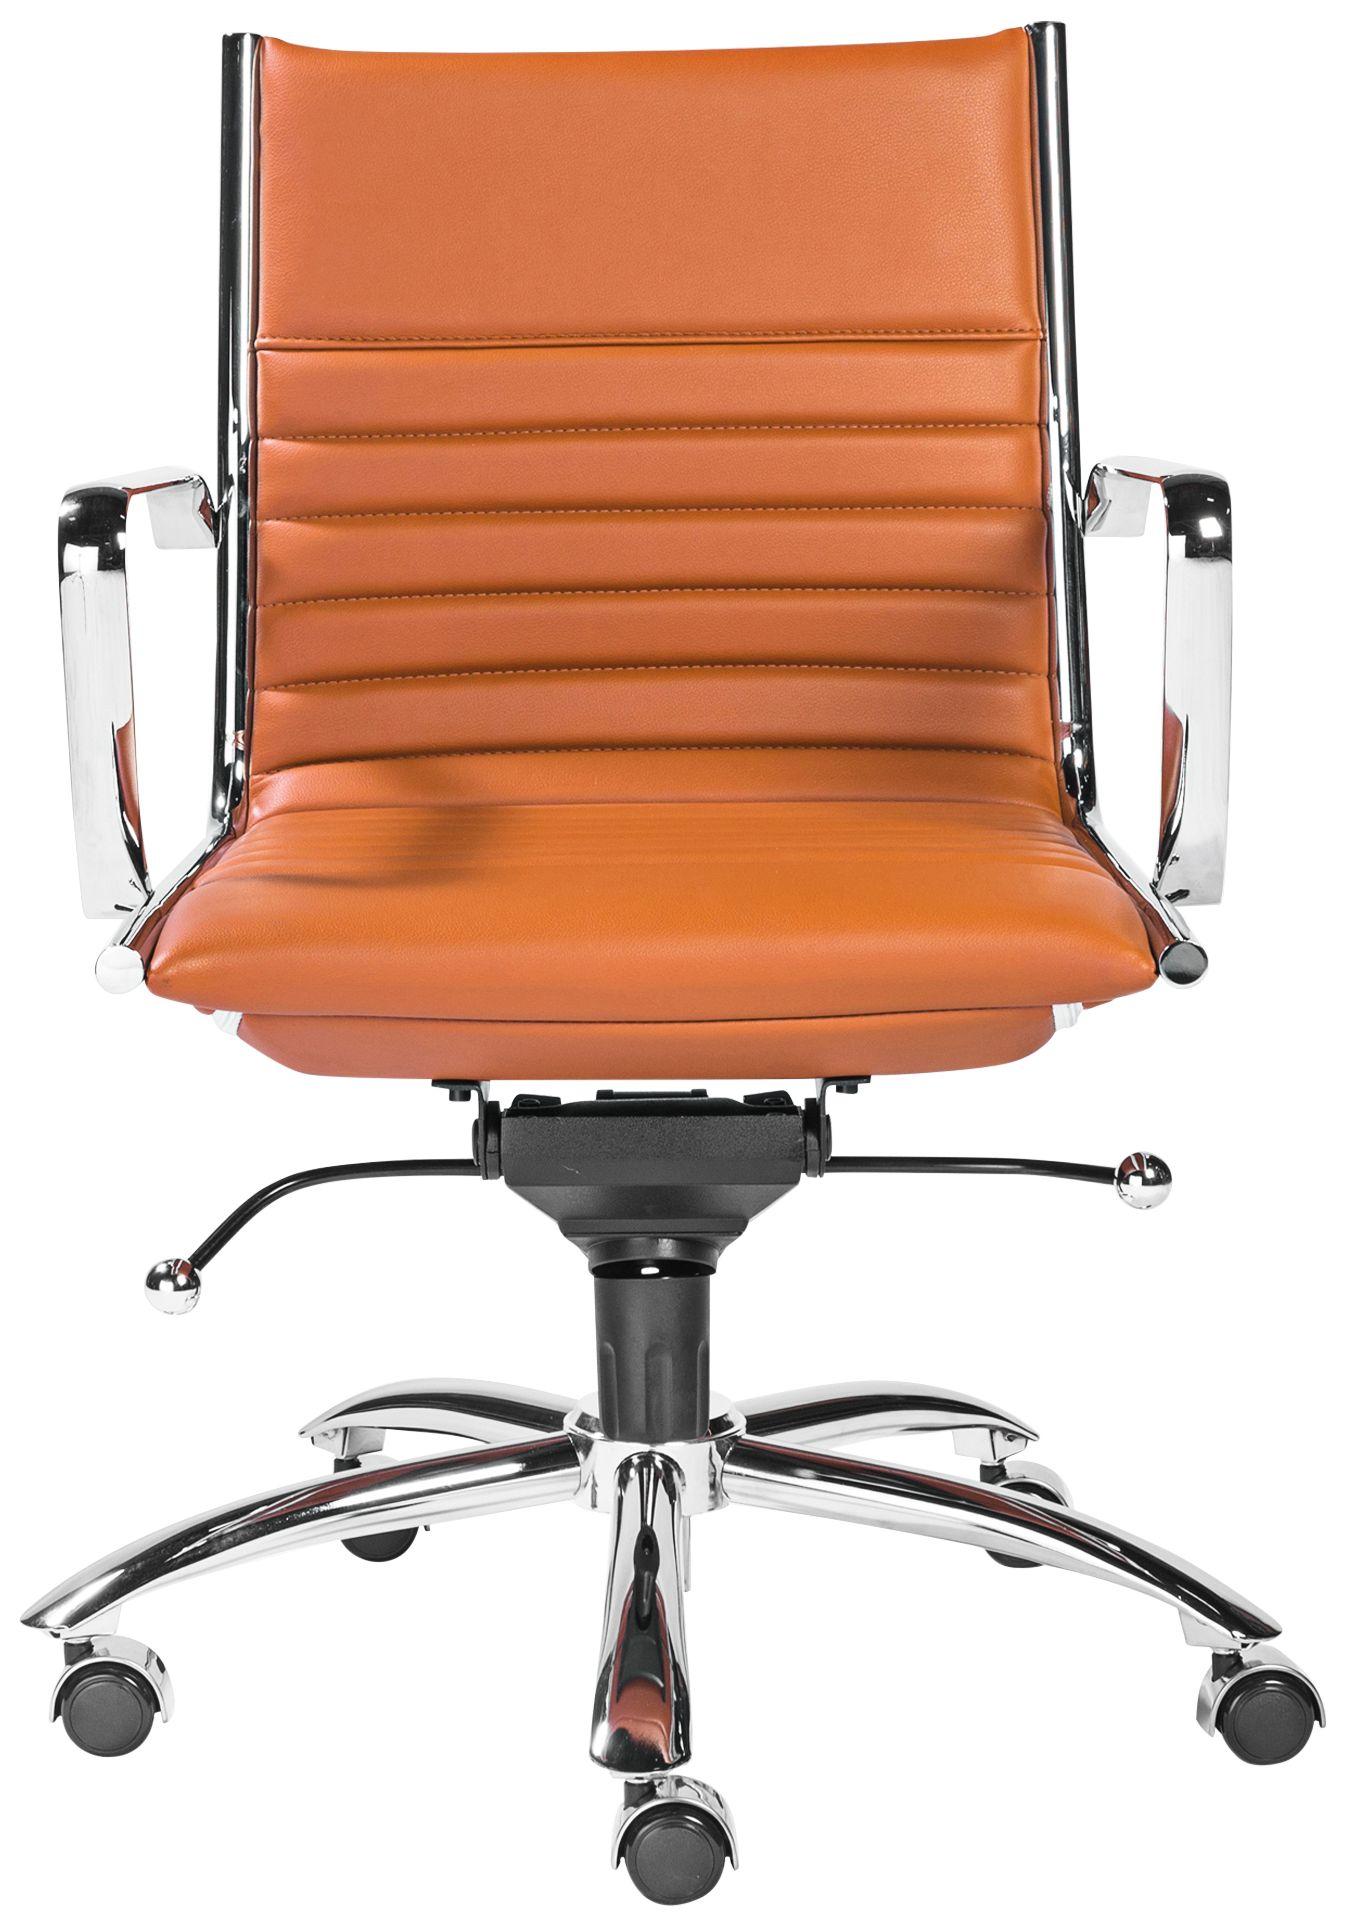 orange office chair cow print covers chairs new home desk lamps plus dirk cognac leatherette low back adjustable